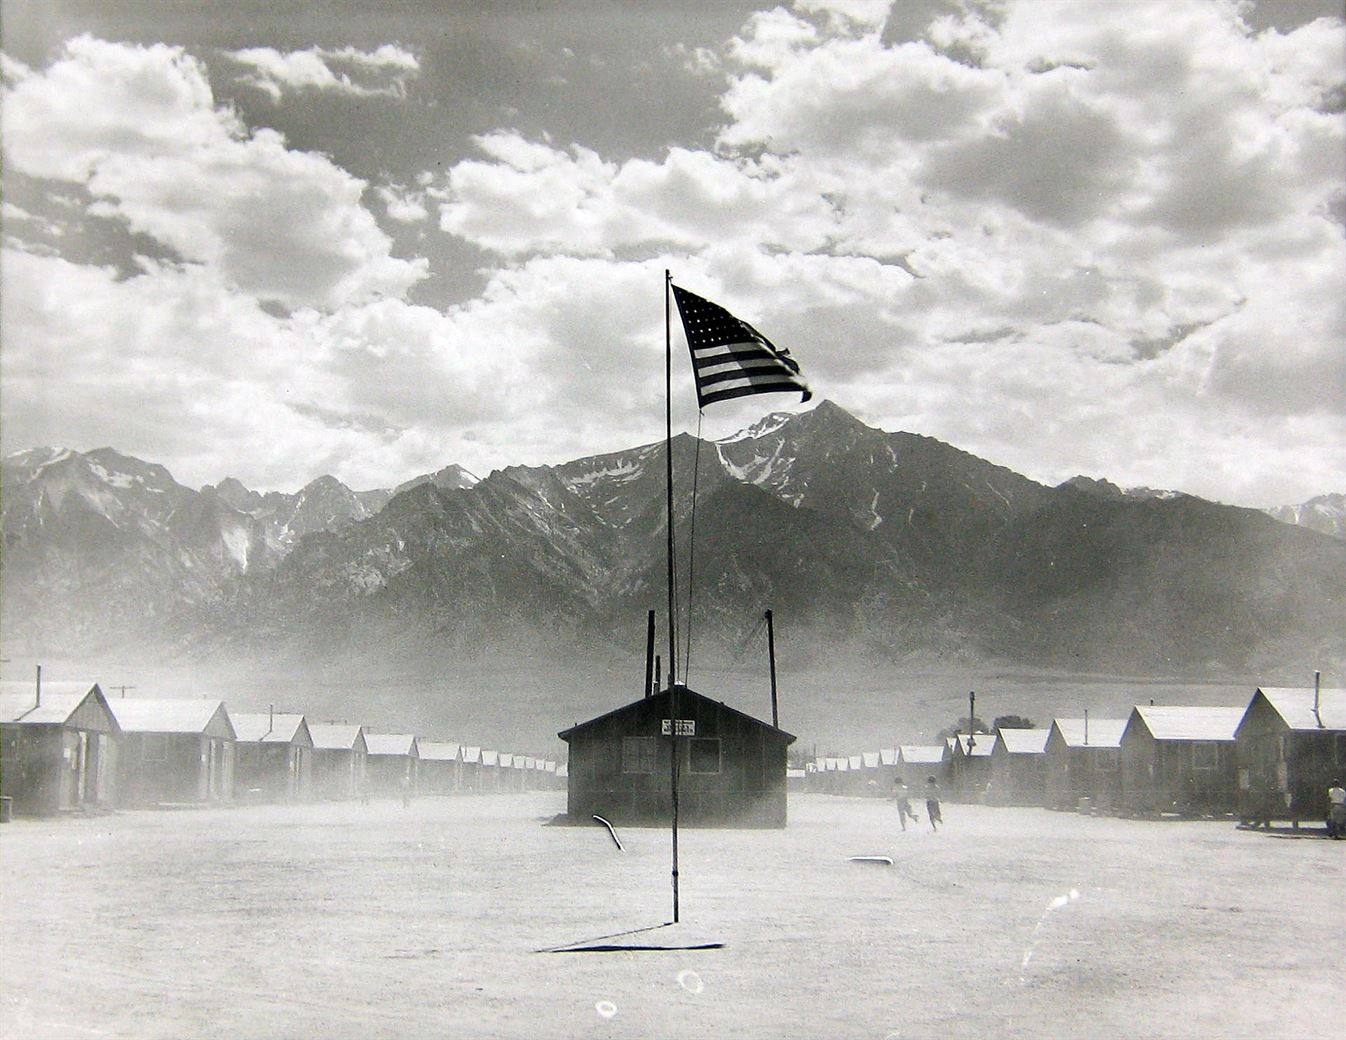 Manzanar Relocation Center, Manzanar, California. July 3, 1942.